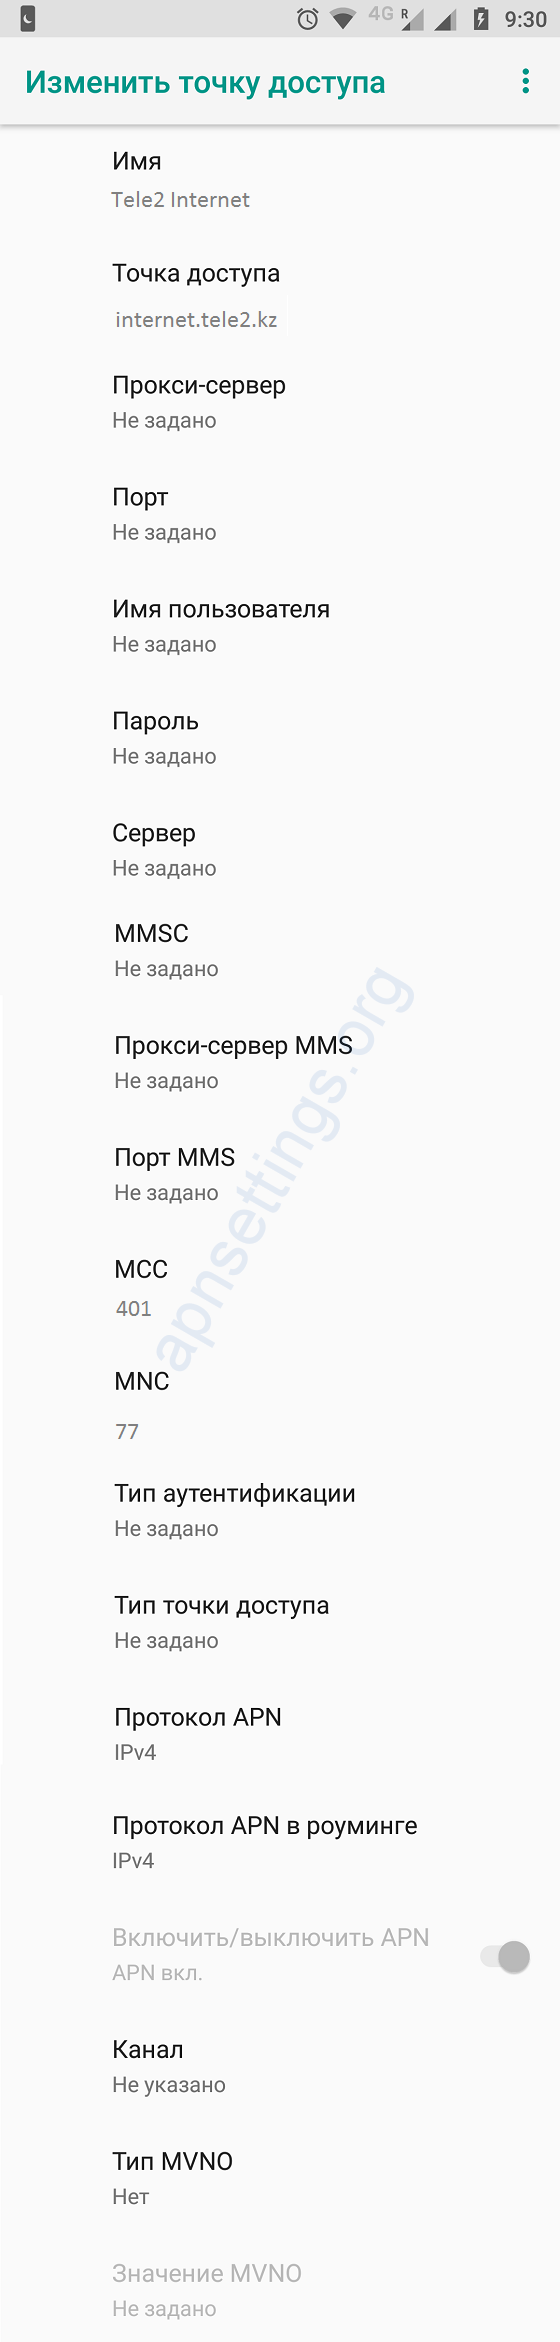 Настройка APN Android Tele2 Казахстан